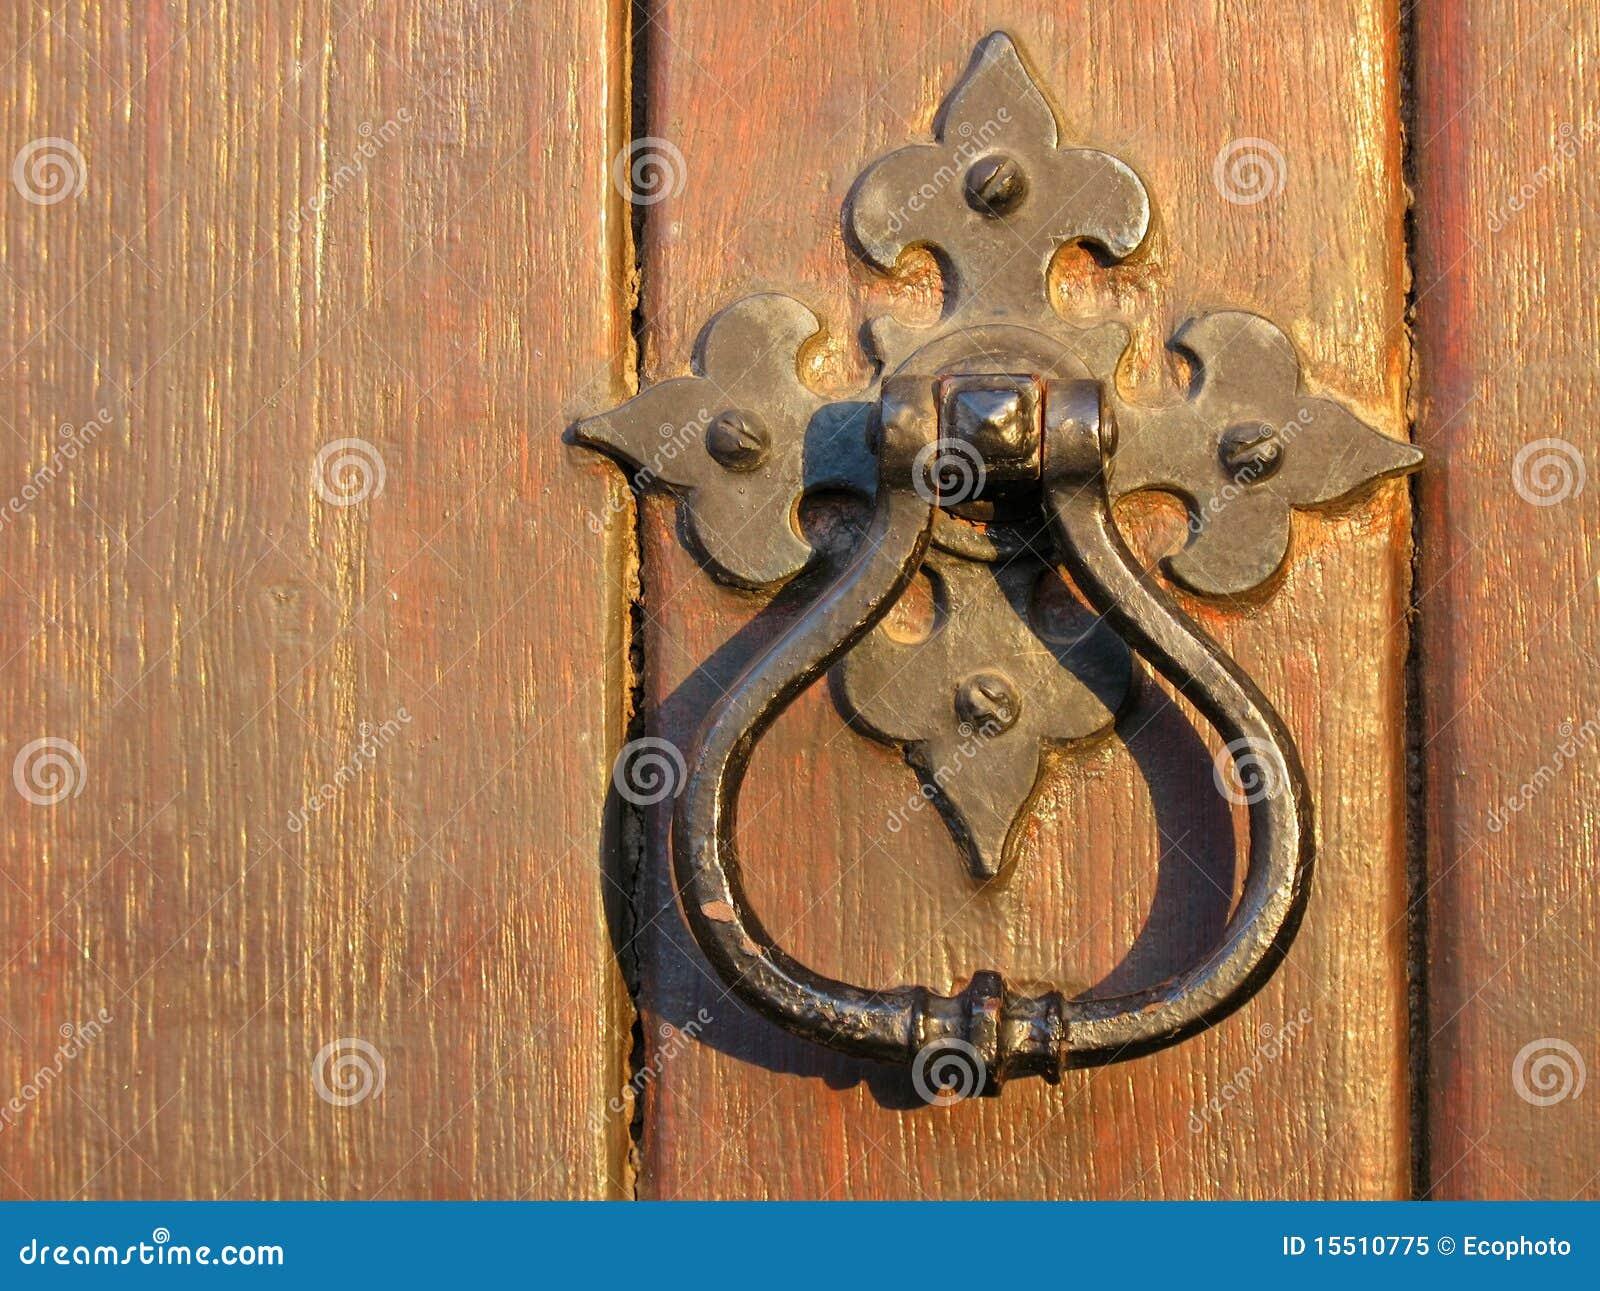 Vintage Door Handle Royalty Free Stock Photo Image 15510775